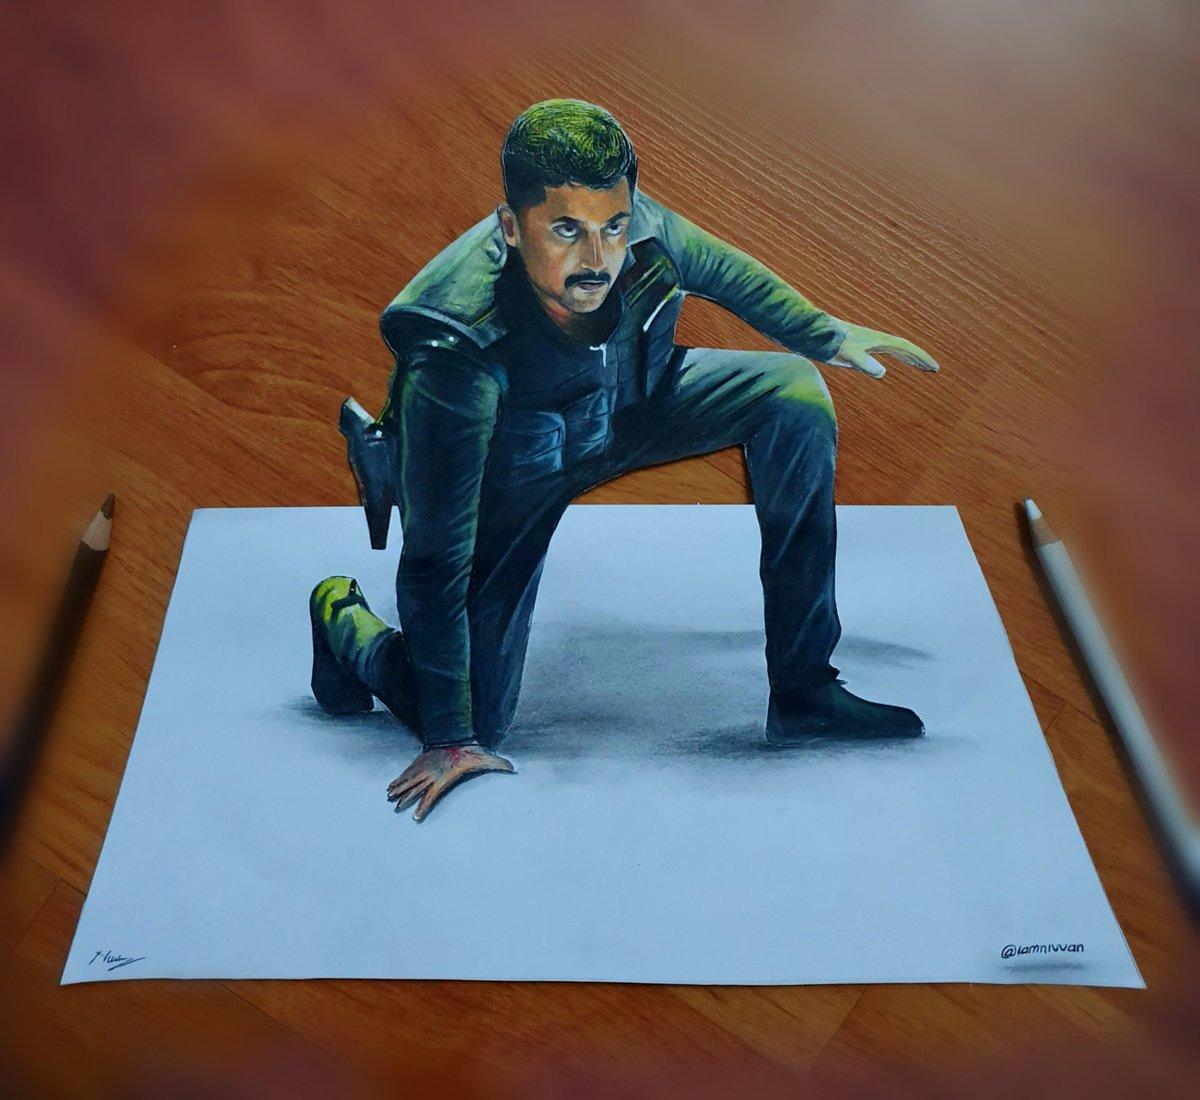 The 3D Artwork of our #kaapaan @Suriya_offl  anna🔥🔥  Kaappaan from 20th September ❤❤ @anavenkat @LycaProductions Materials: A4 paper, Staedtler pencil HB,2B and prisma color pencils ✏ #suriya #suriyasivakumar #suriyafans #sooraraipottru #agaram #art_realistic